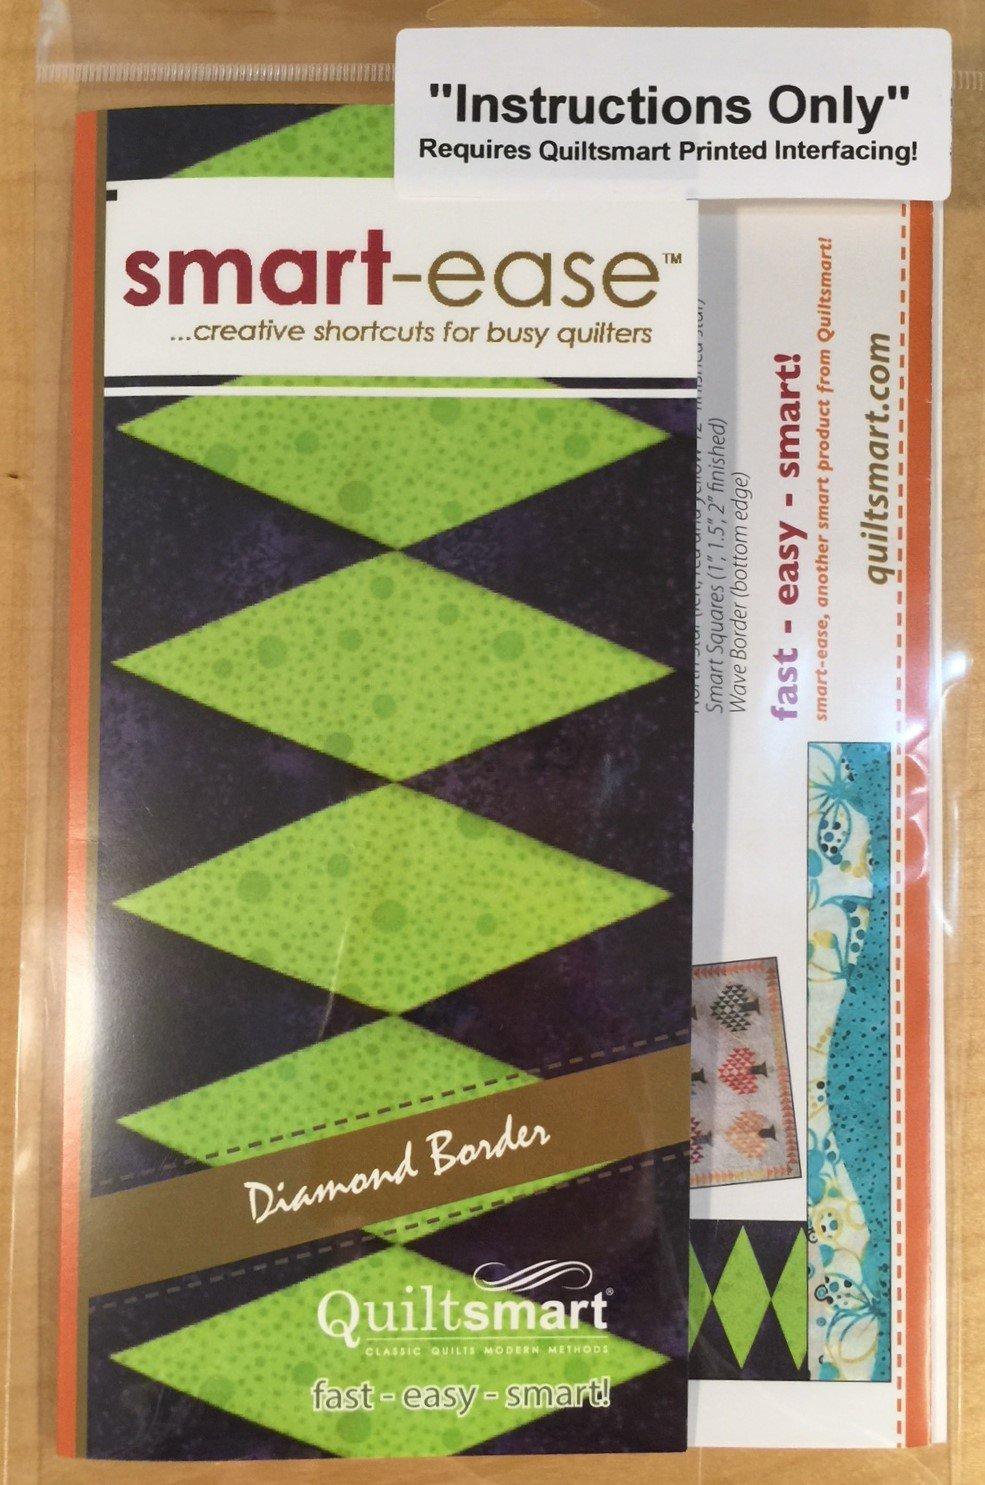 smart-ease Diamond Border - Instructions Only